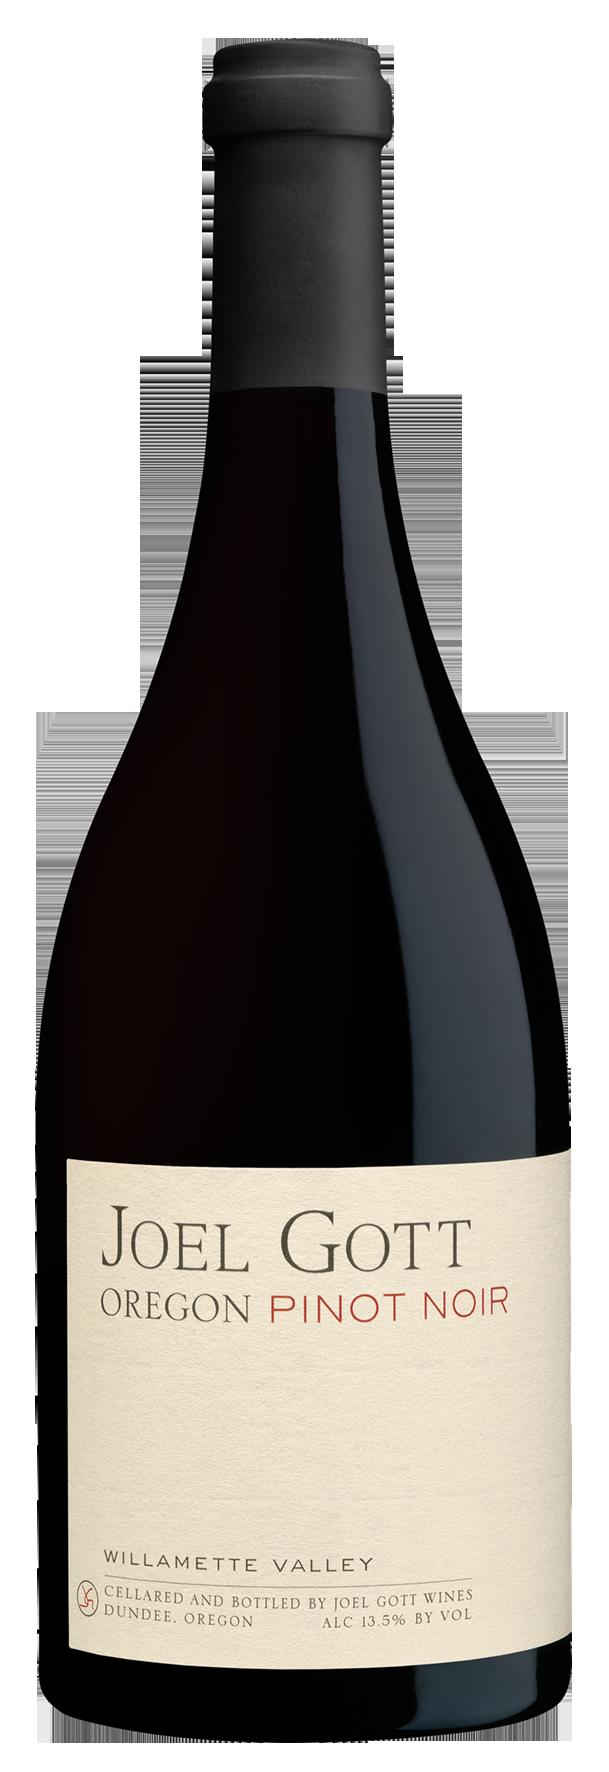 Image 0: Joel Gott Pinot Noir